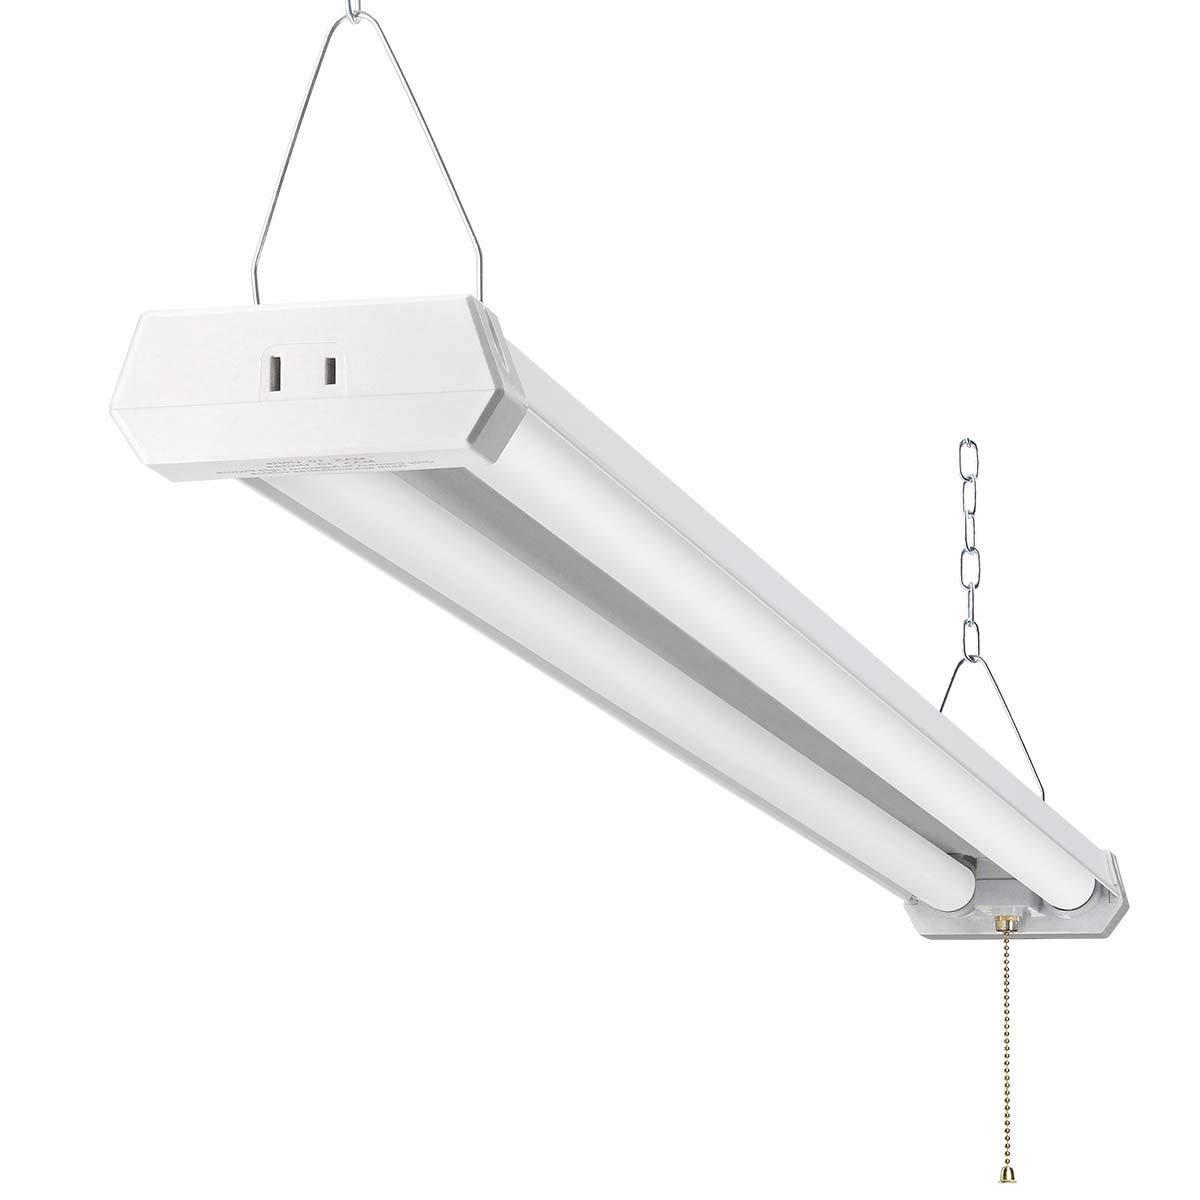 Lithonia Lighting Fluorescent Grow Light *Indoor Gardening* Two 14W T5 Bulbs NEW